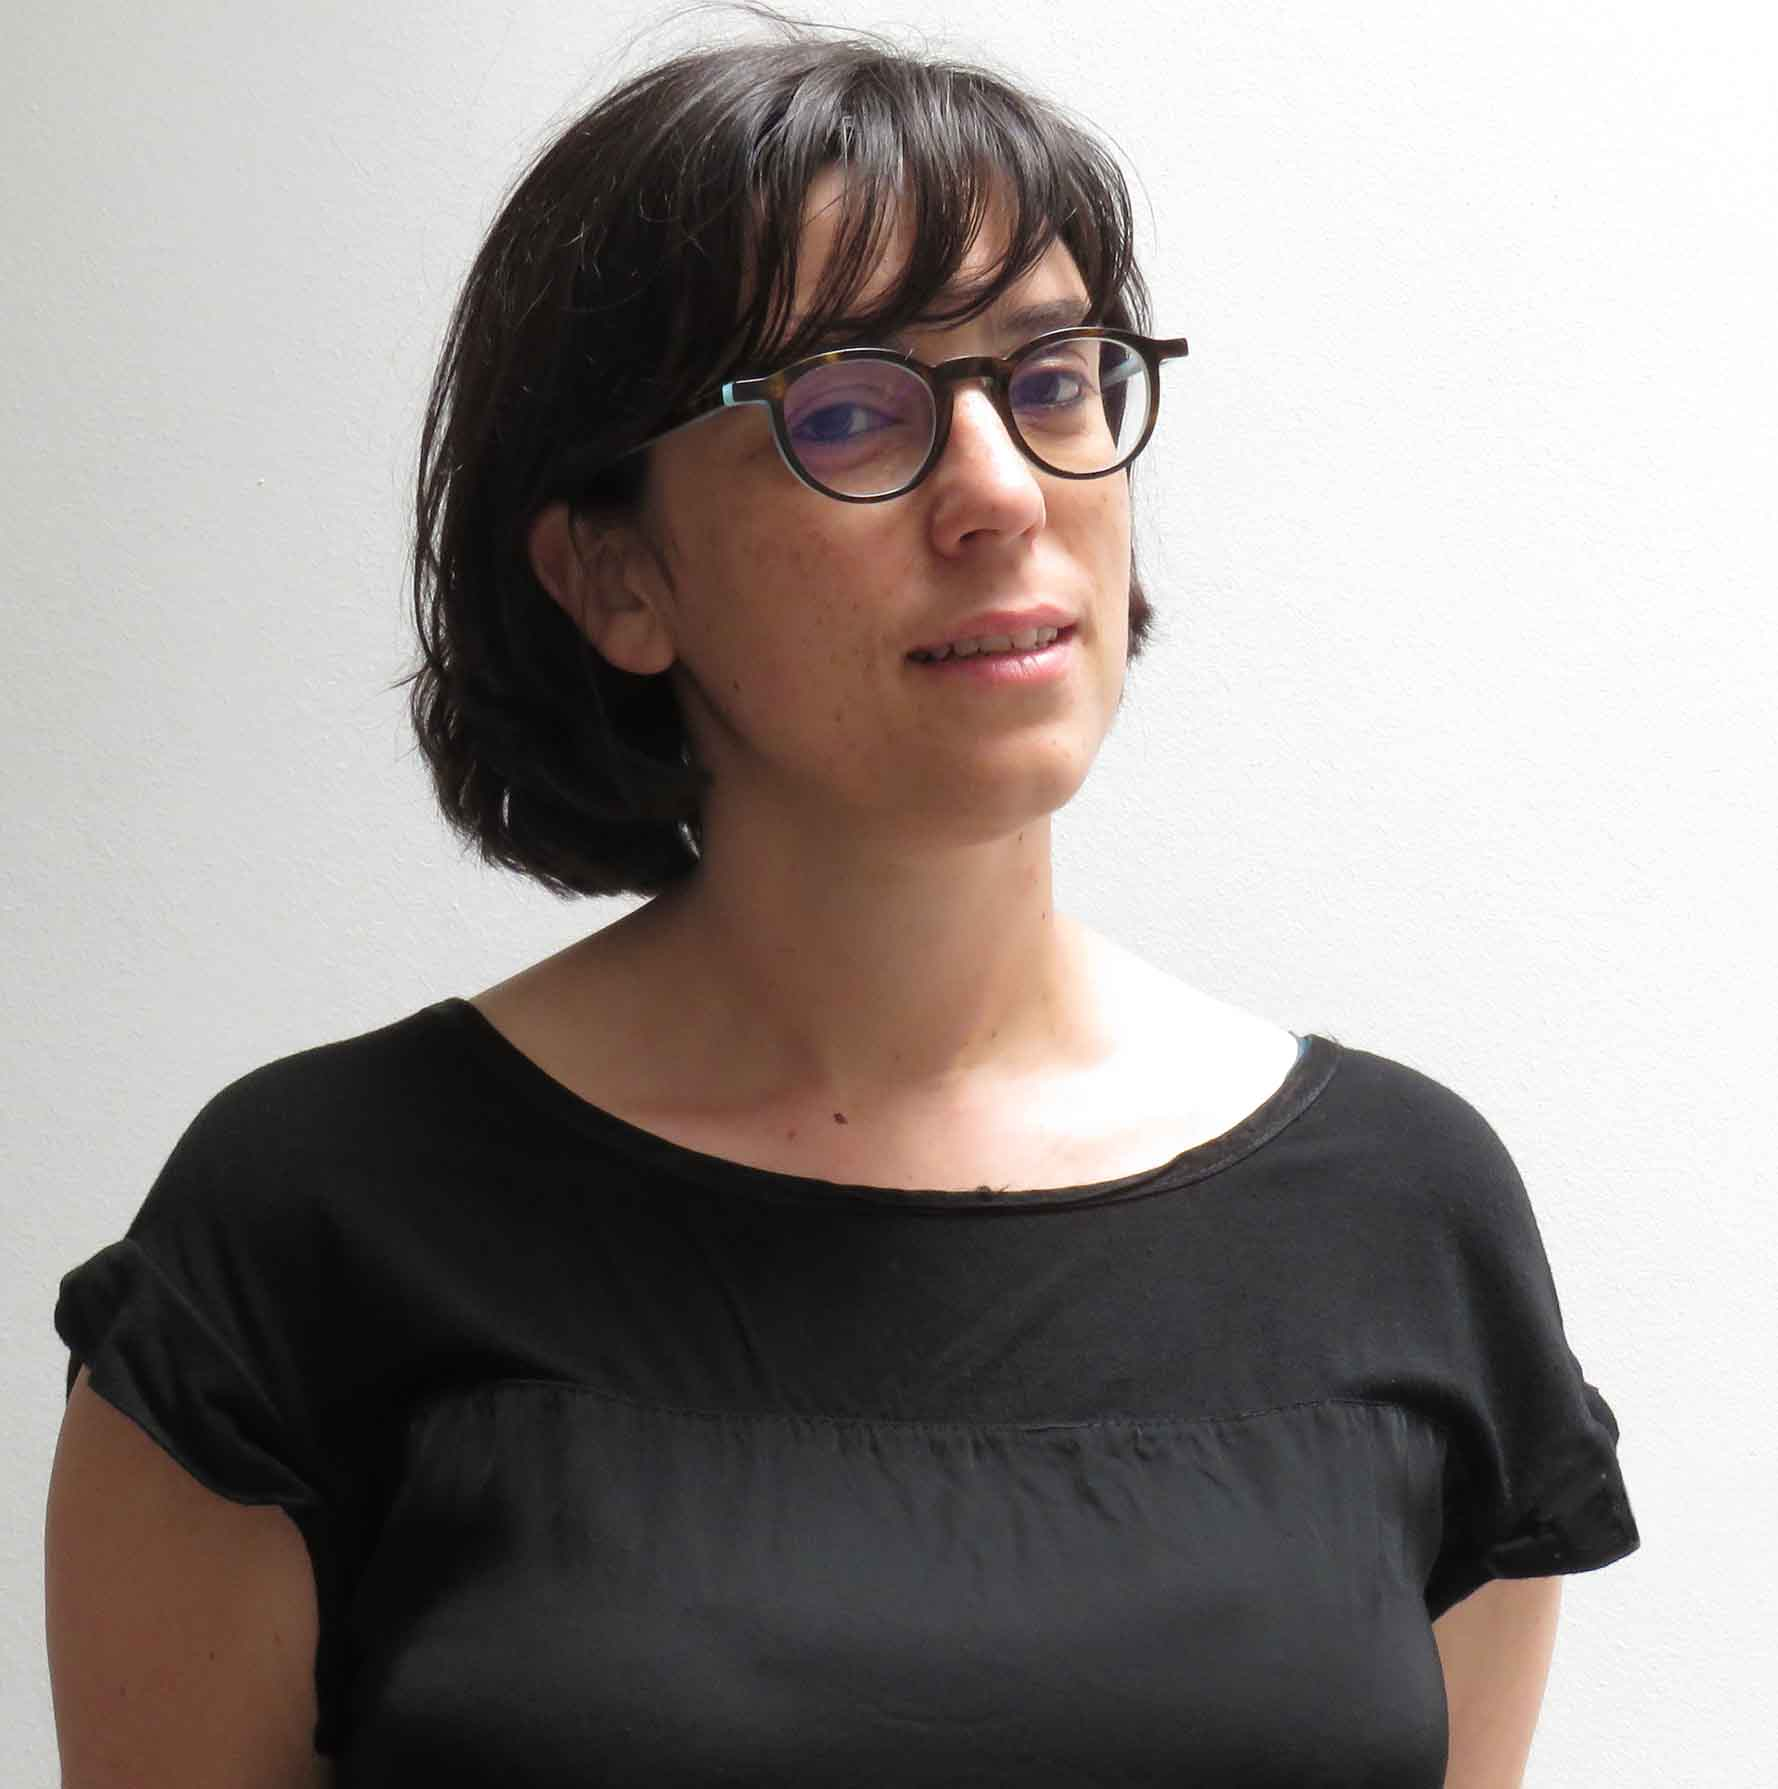 Elisa Gonzalez